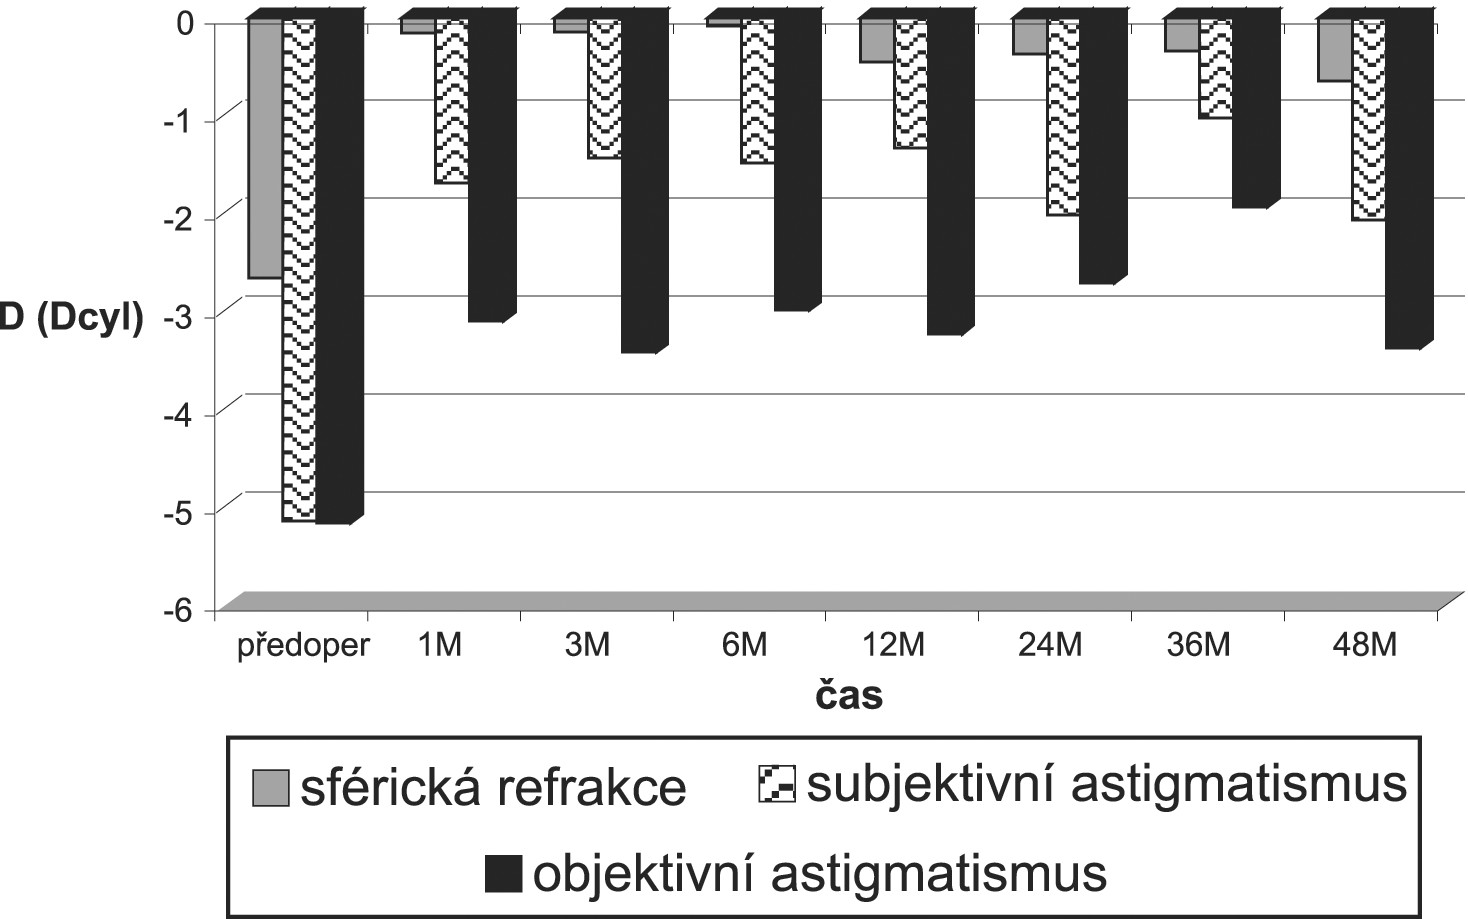 Vývoj pooperační sférické refrakce a astigmatismu.